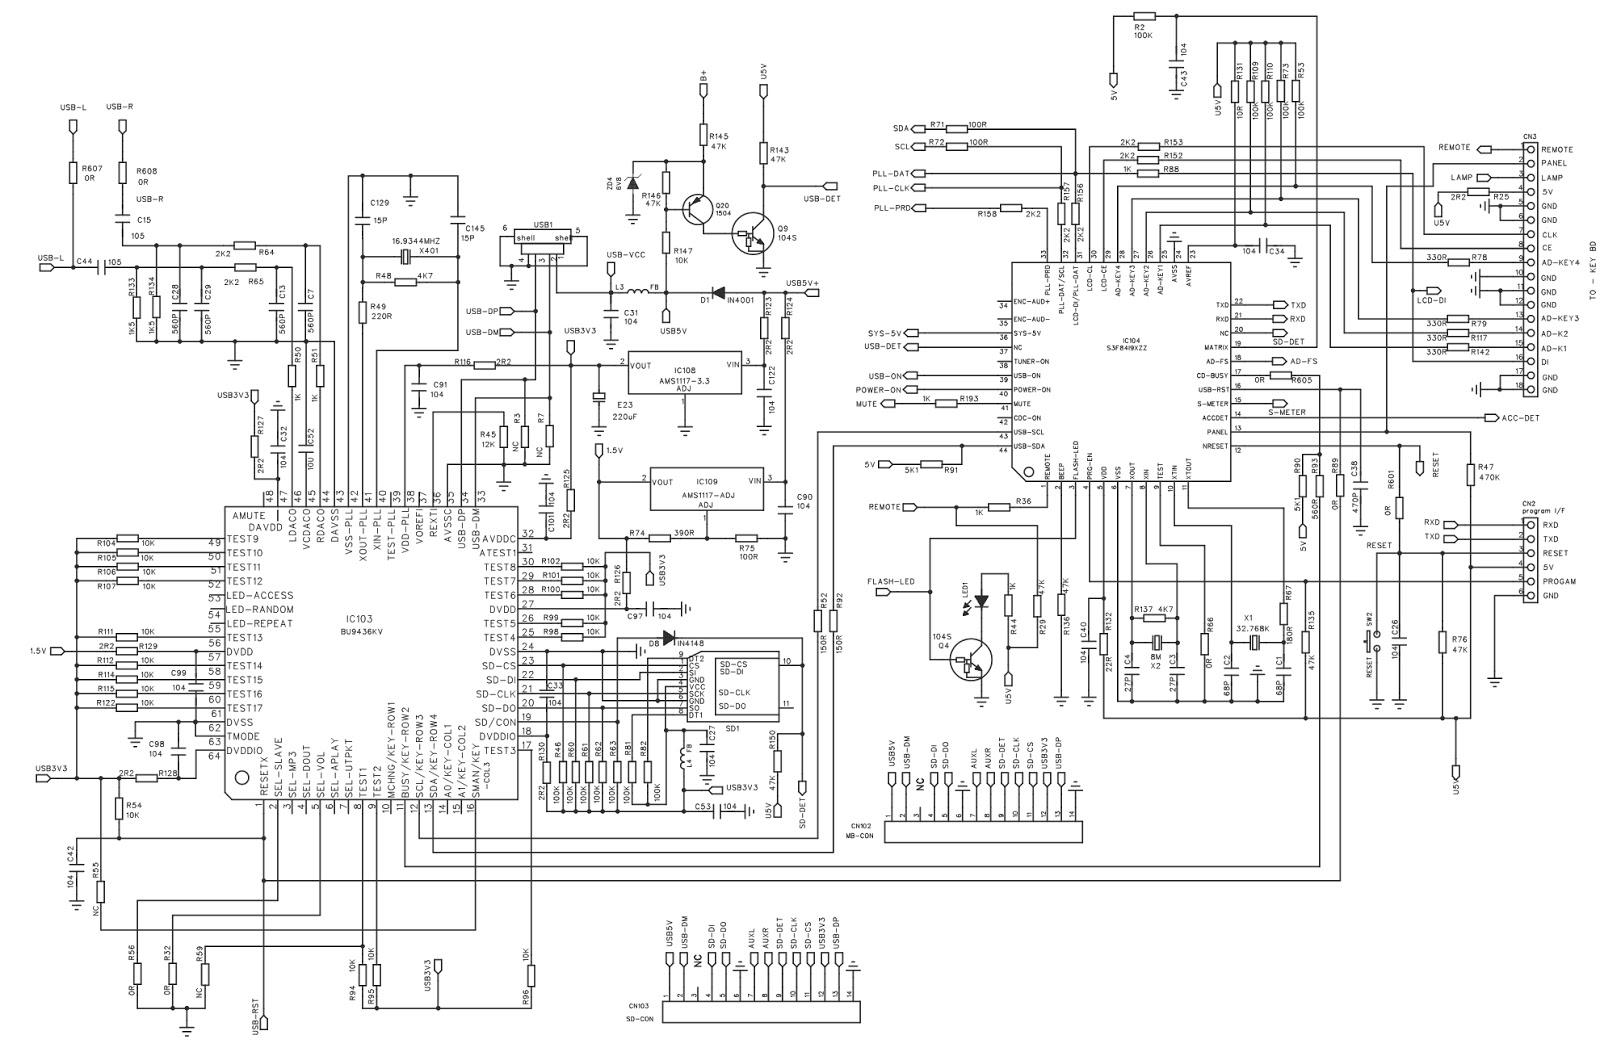 tda7388 circuit diagram